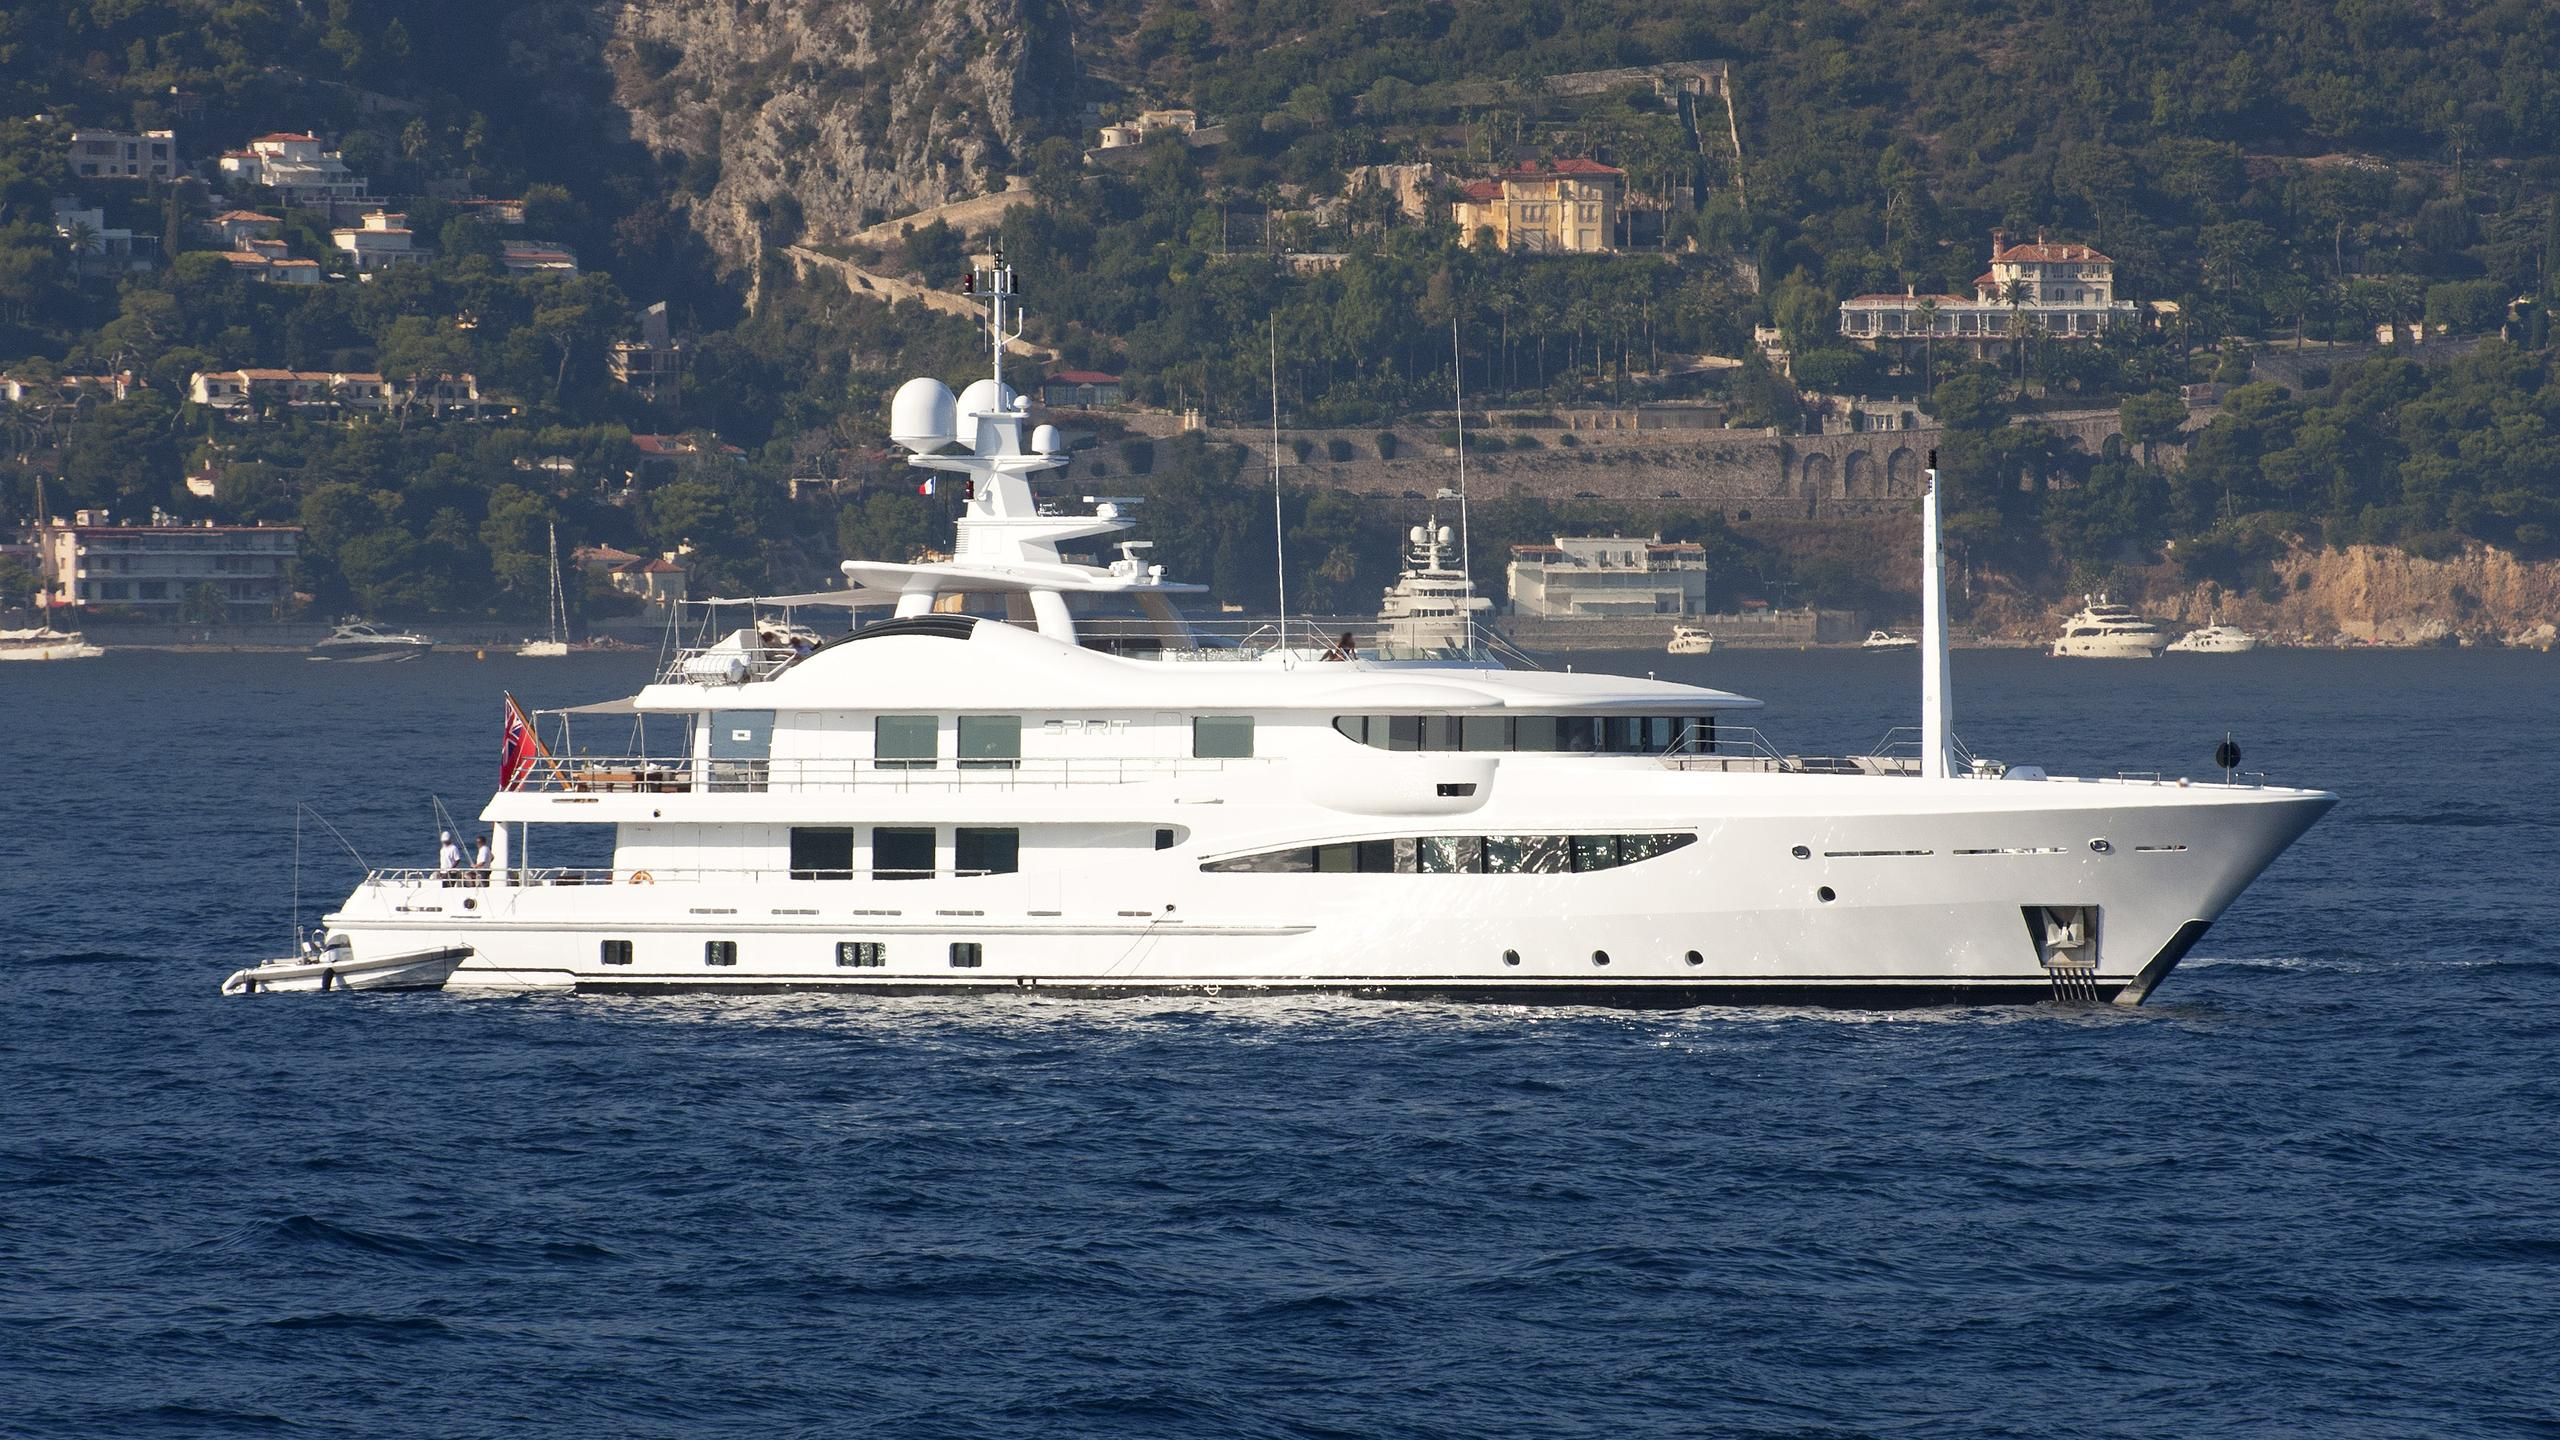 spirit-motor-yacht-amels-2011-54m-profile